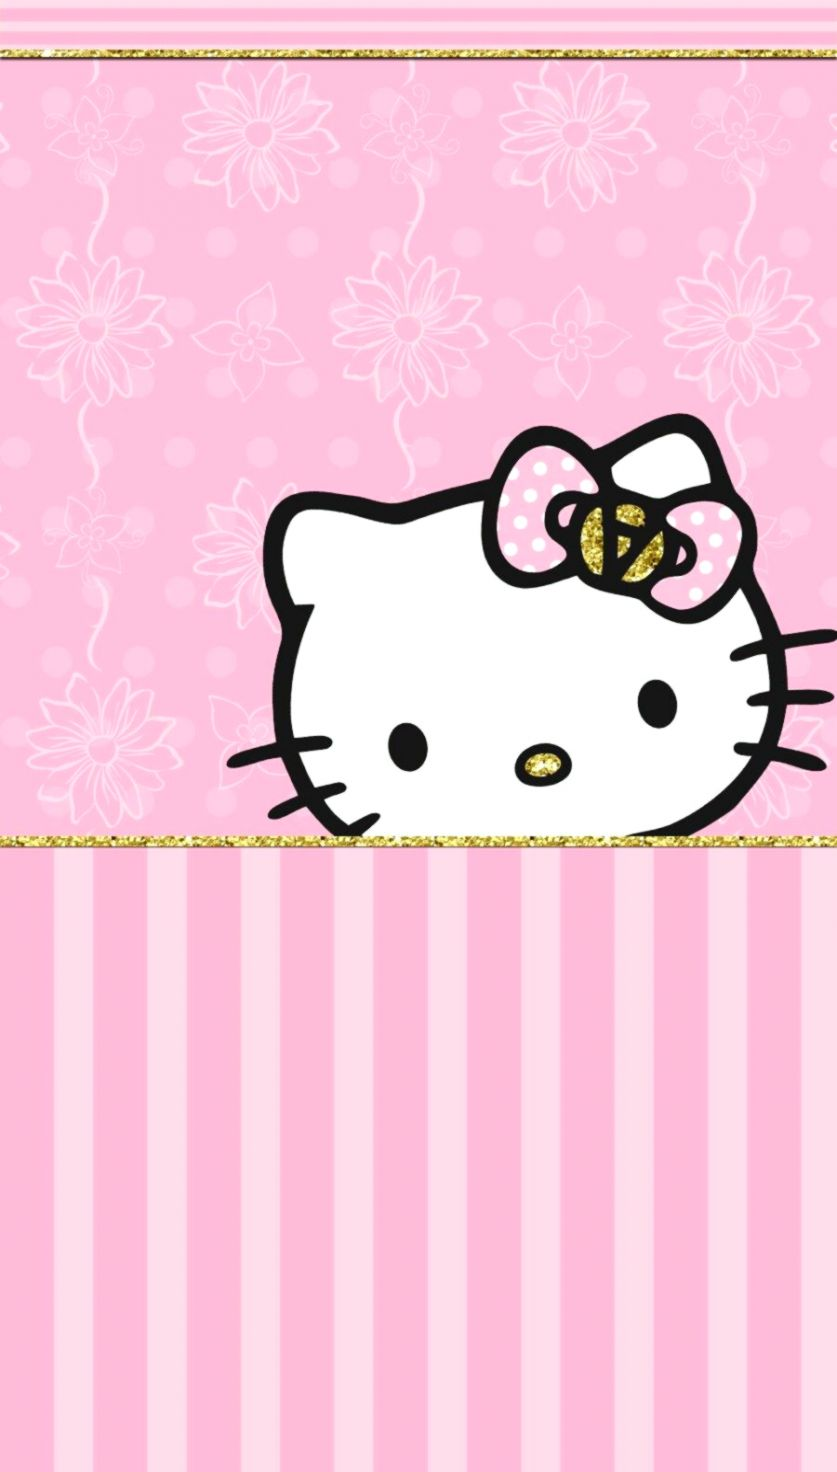 52 Hello Kitty Wallpaper Pictures On Wallpapersafari